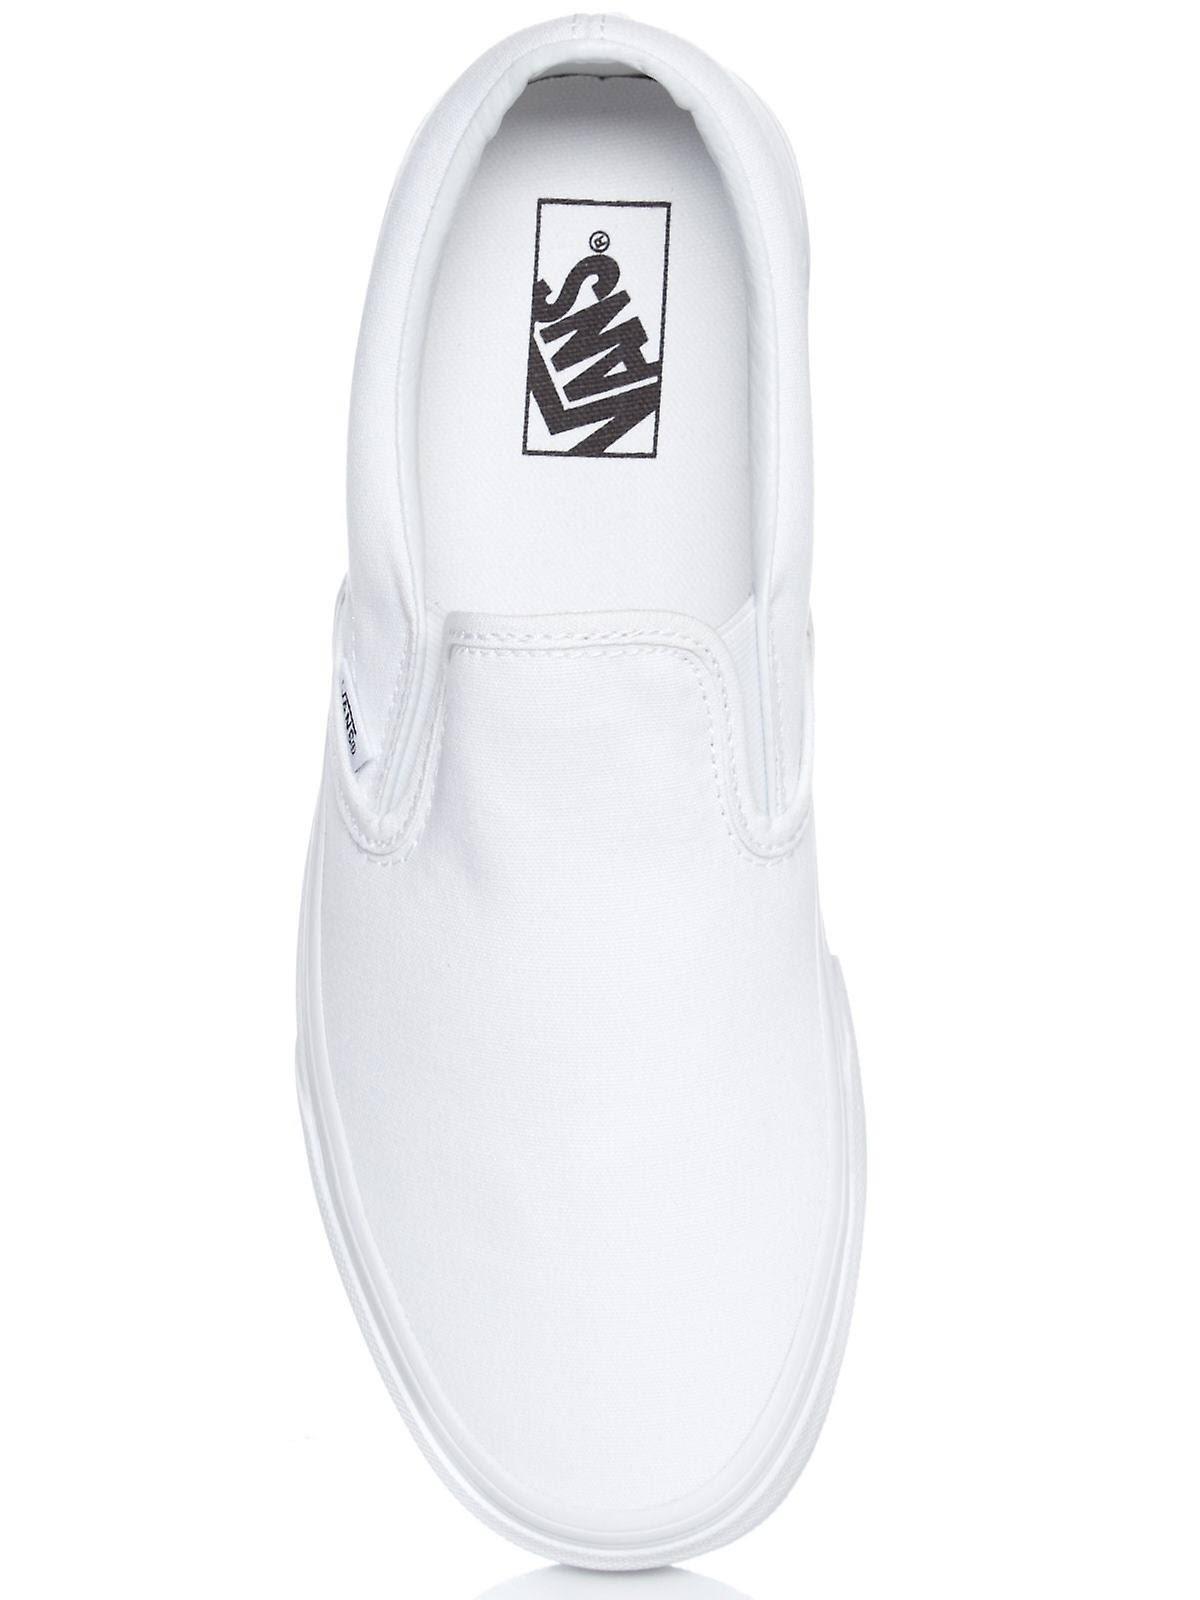 Uk Classic Truewhite Canvas On 9 Slip Vans Blanco Tamaño Color 0adq0T